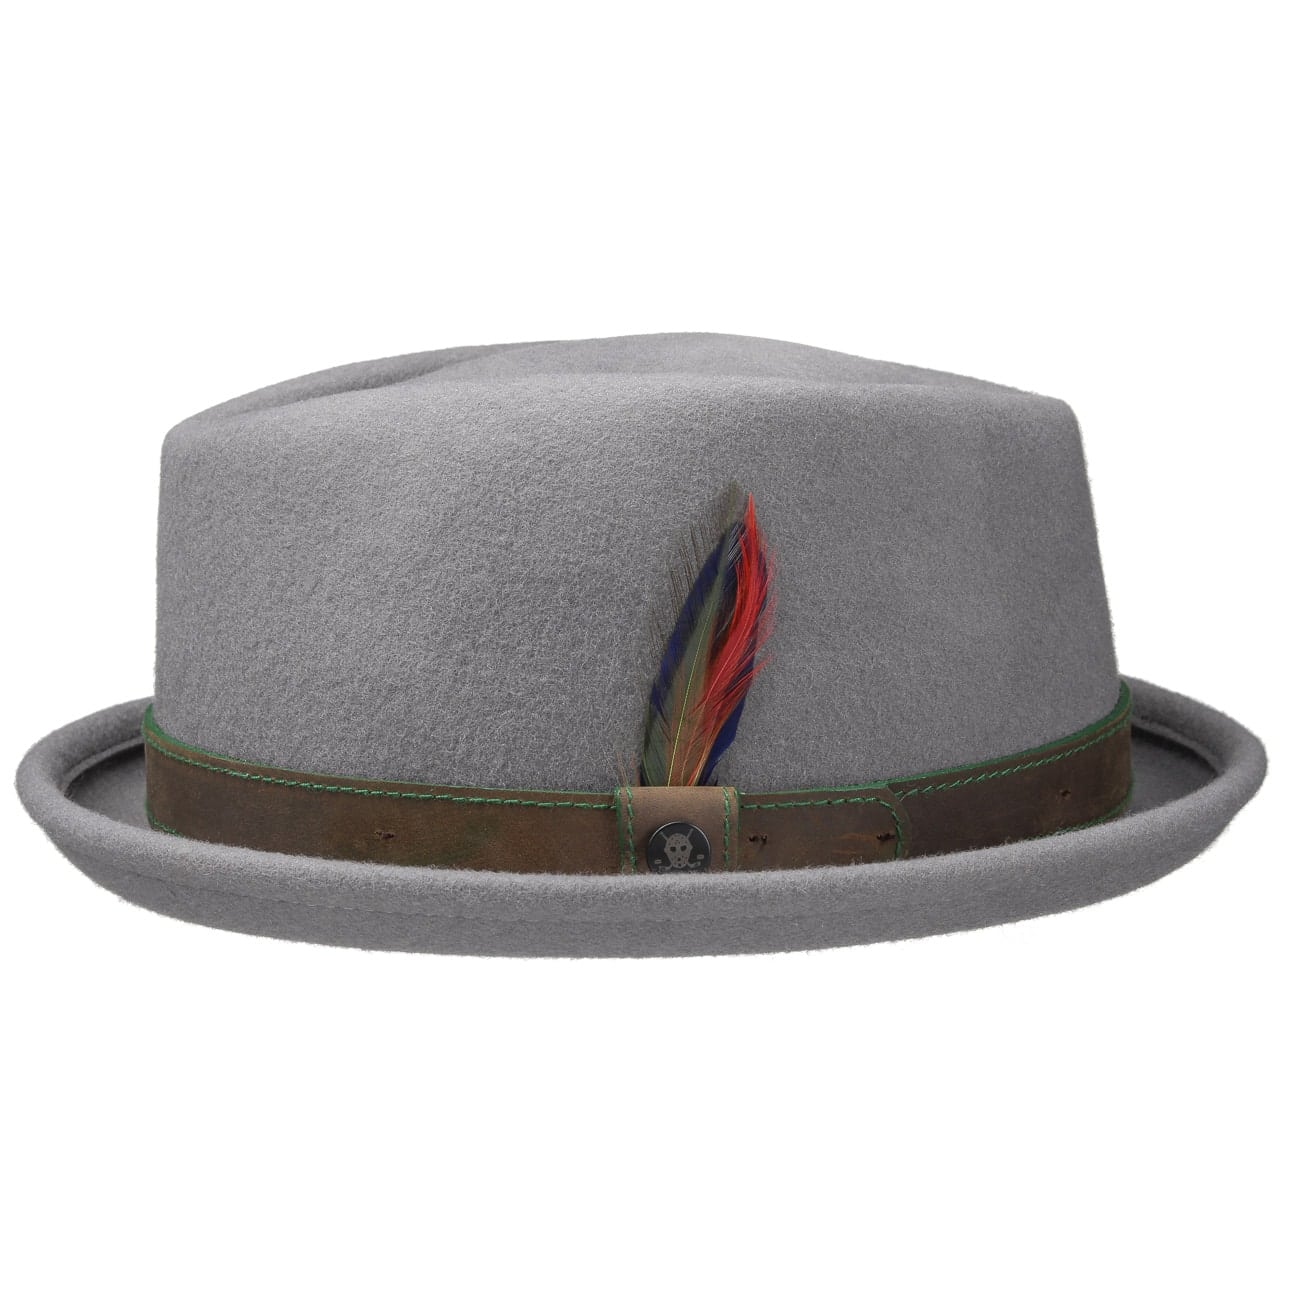 Sombrero Manhat Pork Pie by Stetson - Sombreros - sombreroshop.es 8825a046bba